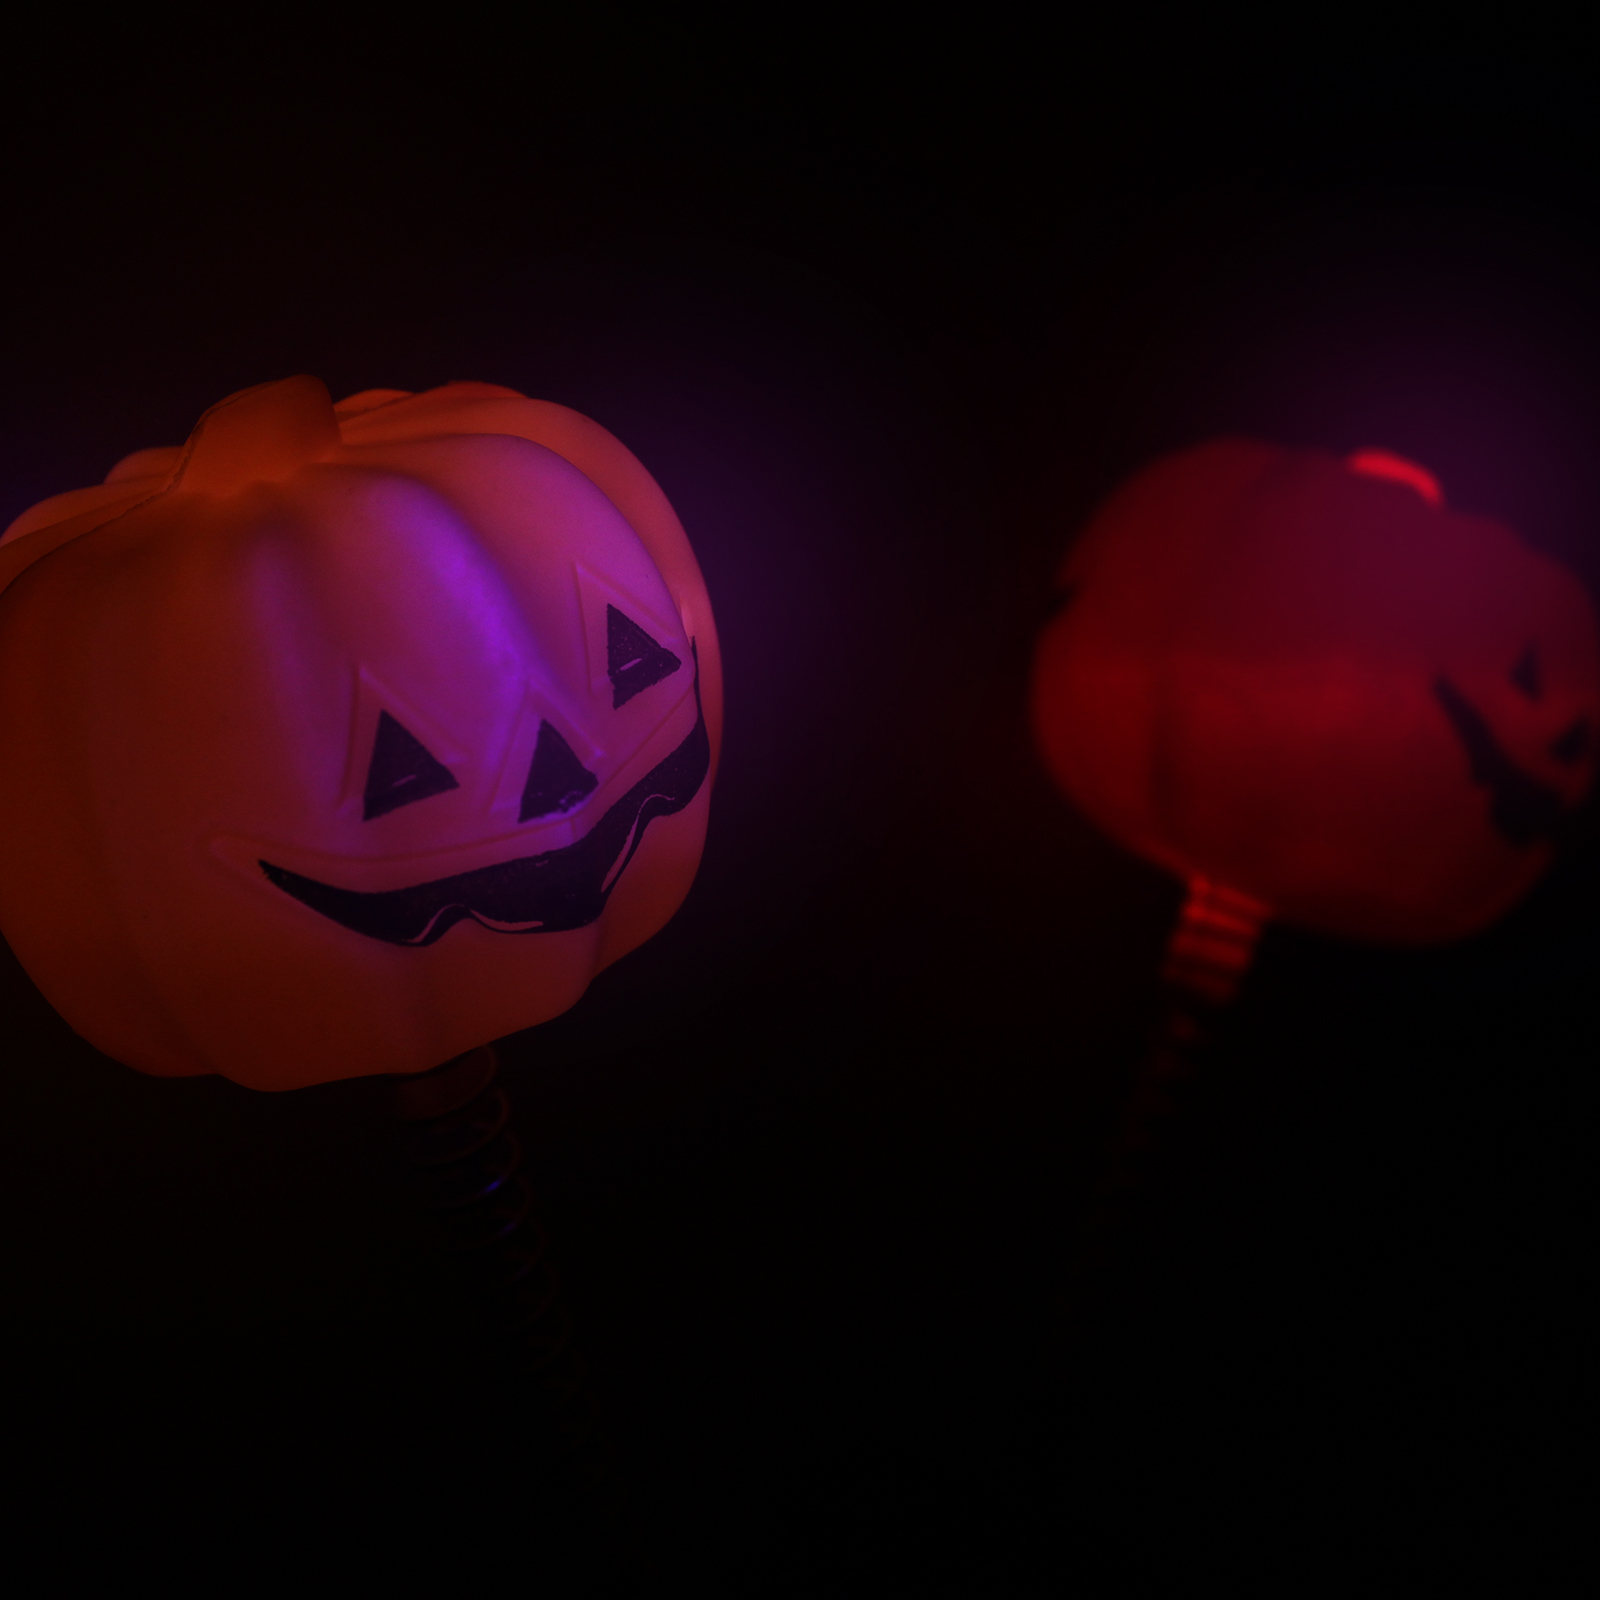 Led light up flashing pumpkins halloween party costume